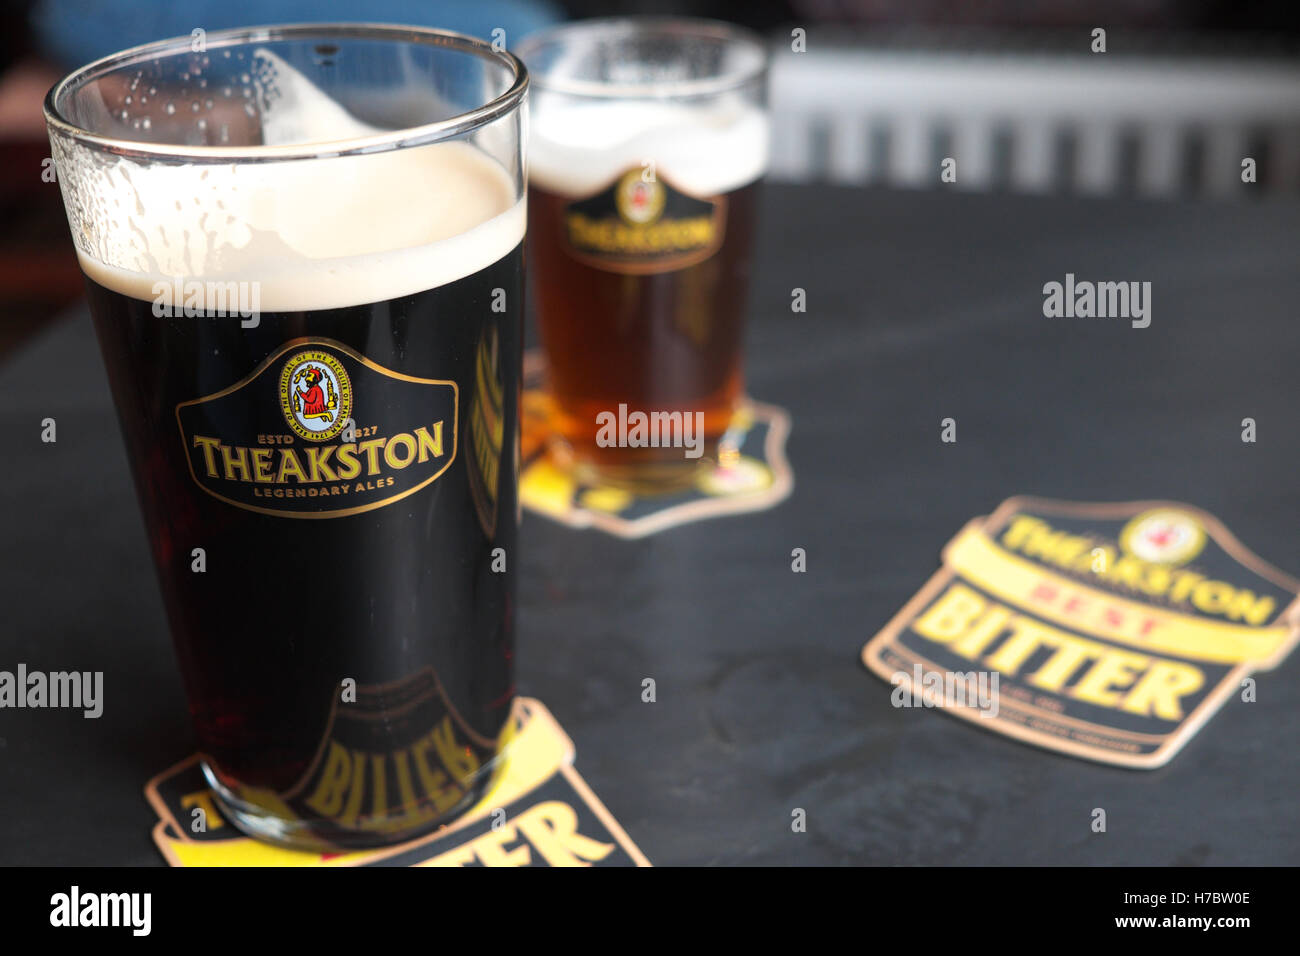 Theakston Old Peculiar dark beer pint glass of beer in pub in Yorkshire UK - Stock Image